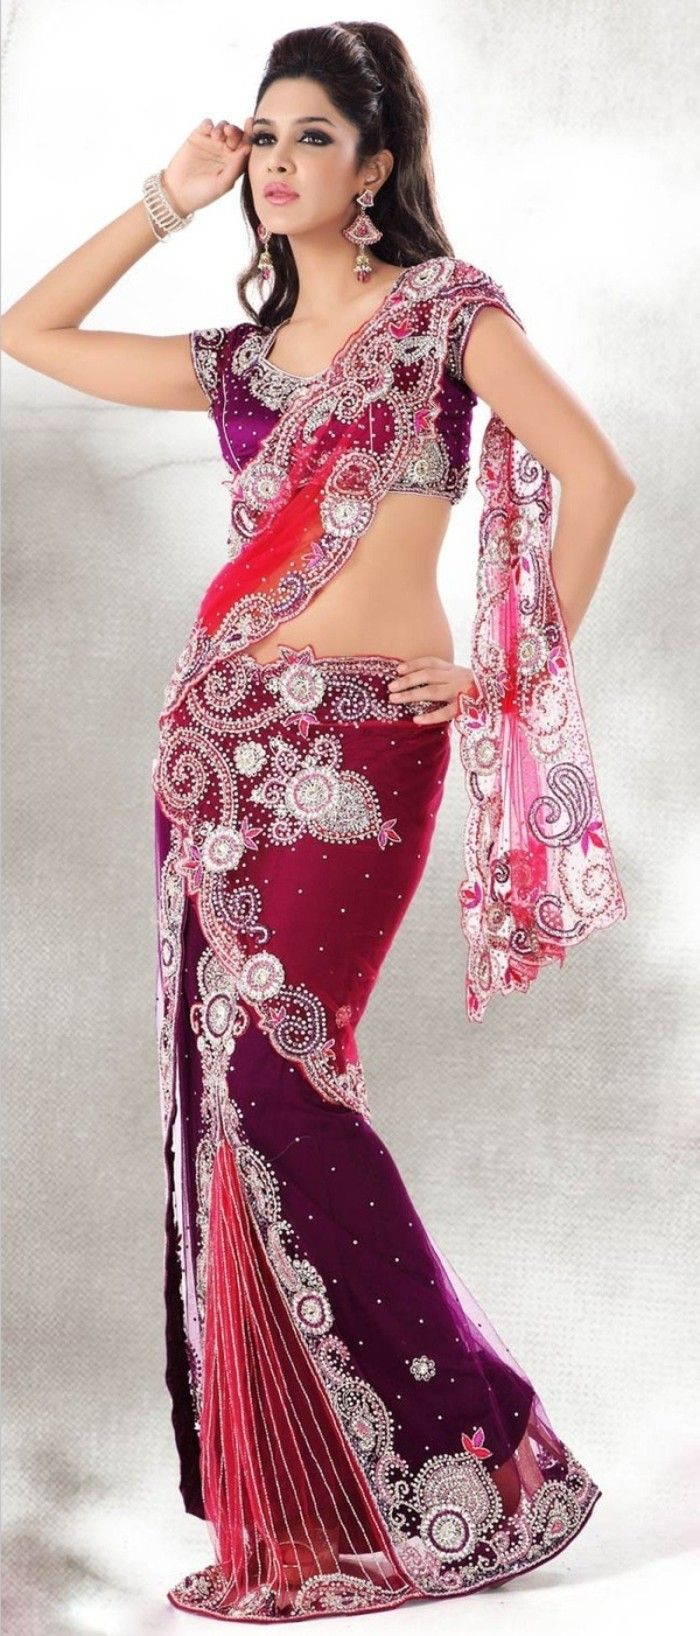 Pin de Lier Lier en World Ethnic & Cultural Beauties, jewelry ...